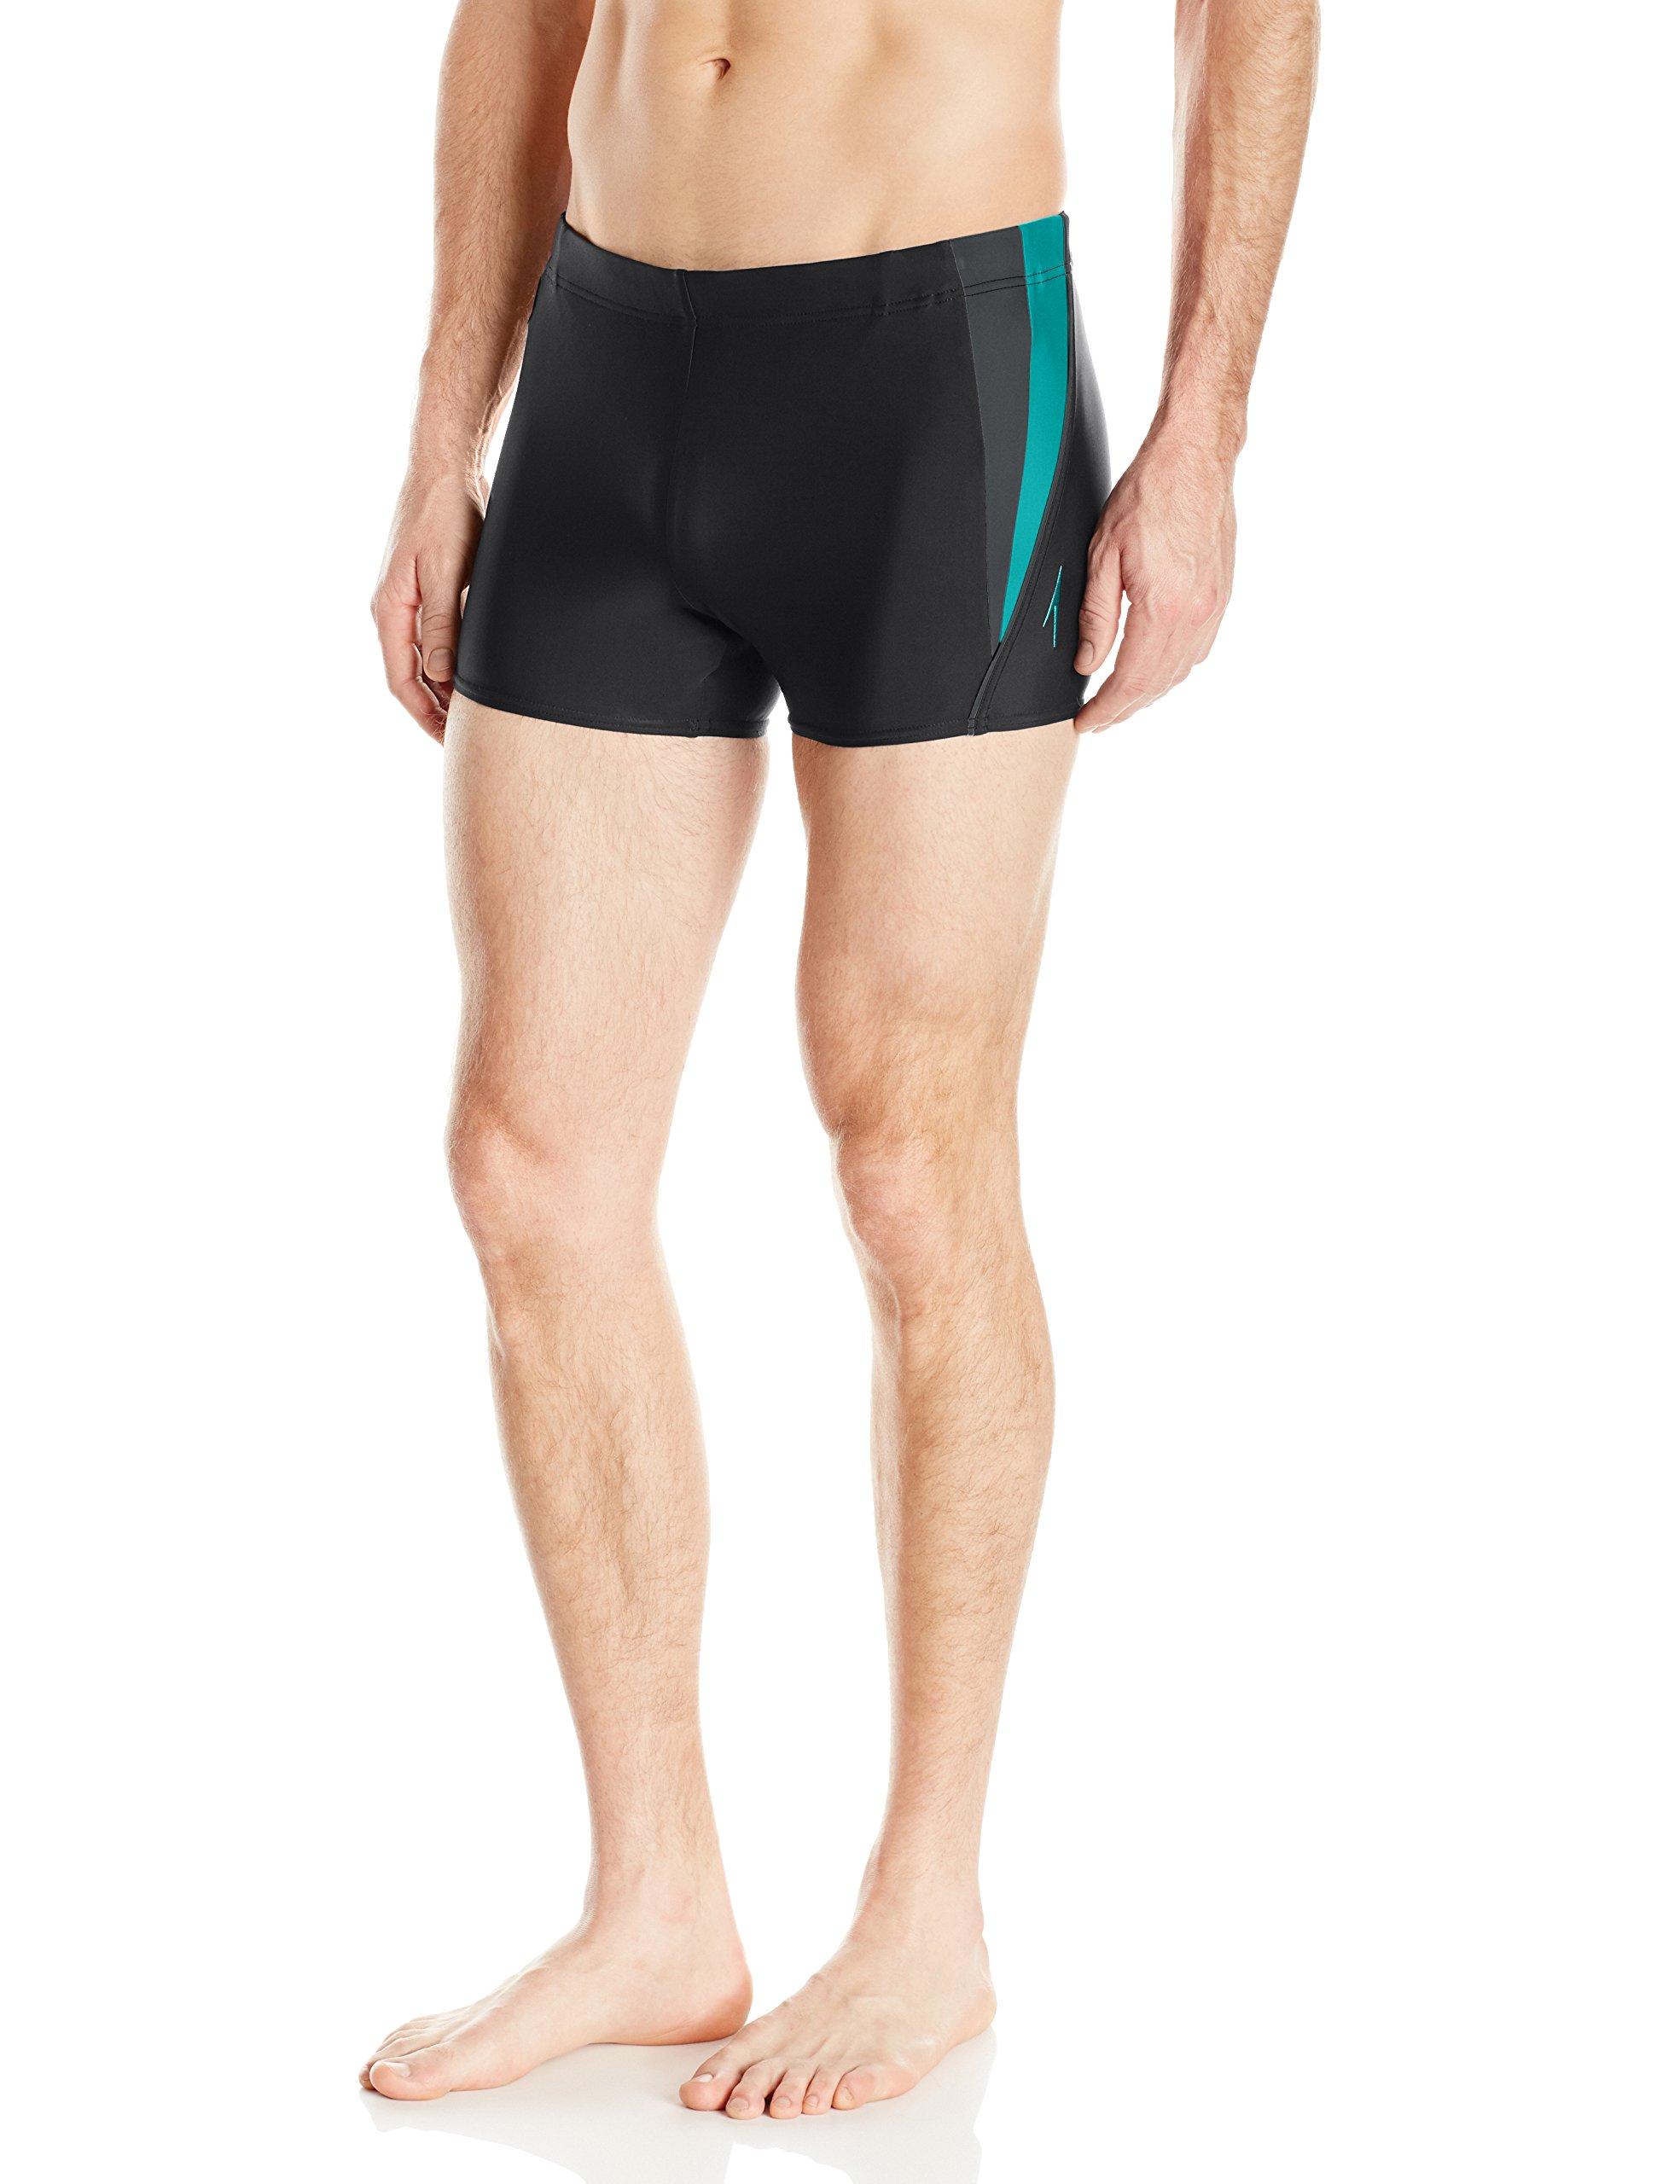 Speedo Men's Fitness Splice powerflex eco Square Leg Swimsuit, Black/Green, Small by Speedo